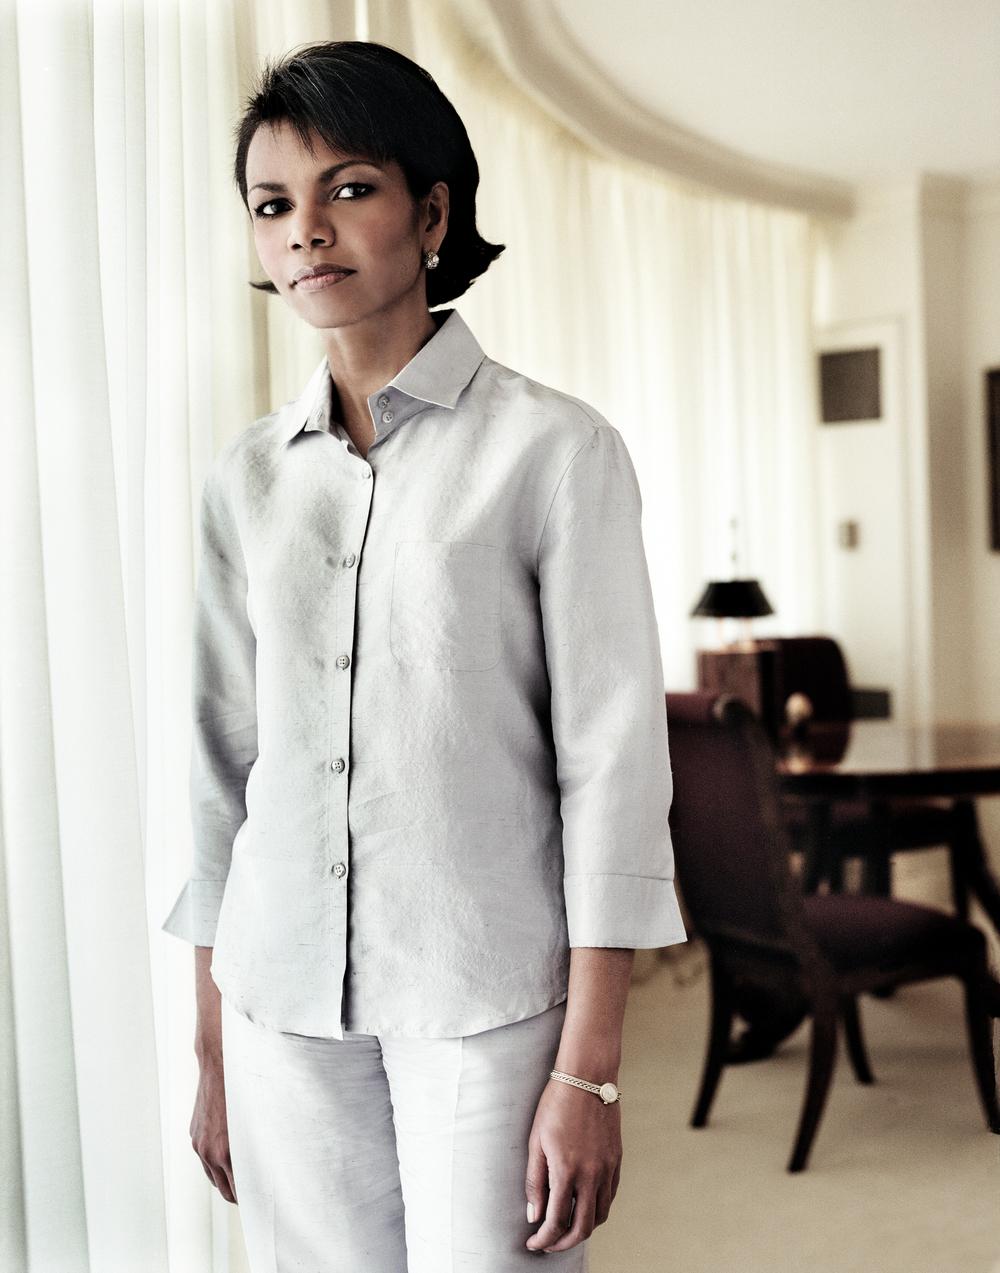 Condoleezza Rice, African American History, Black History, KOLUMN Magazine, KOLUMN